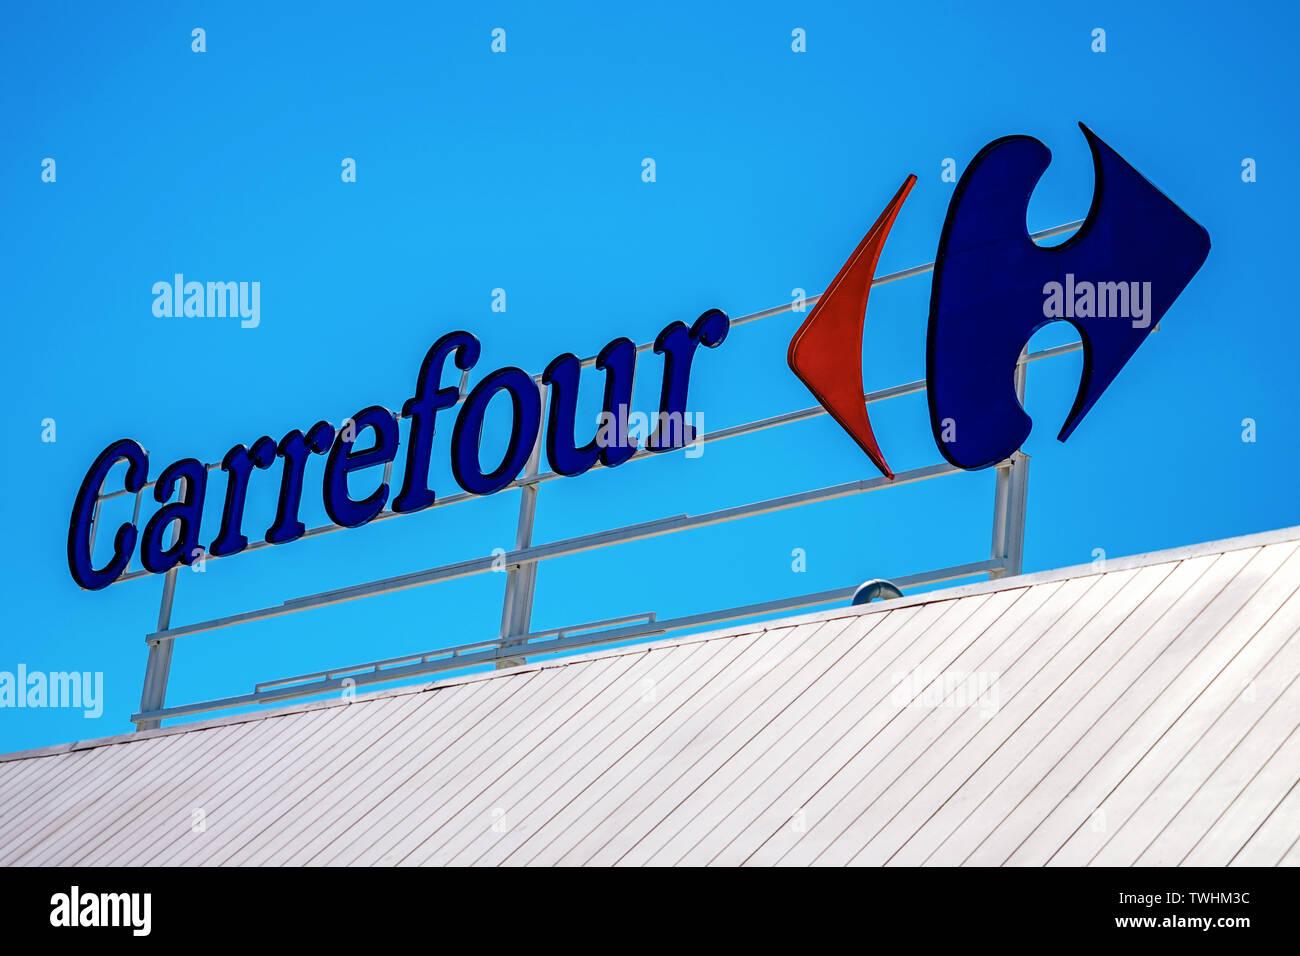 Carrefour Spain Stock Photos Carrefour Spain Stock Images Alamy